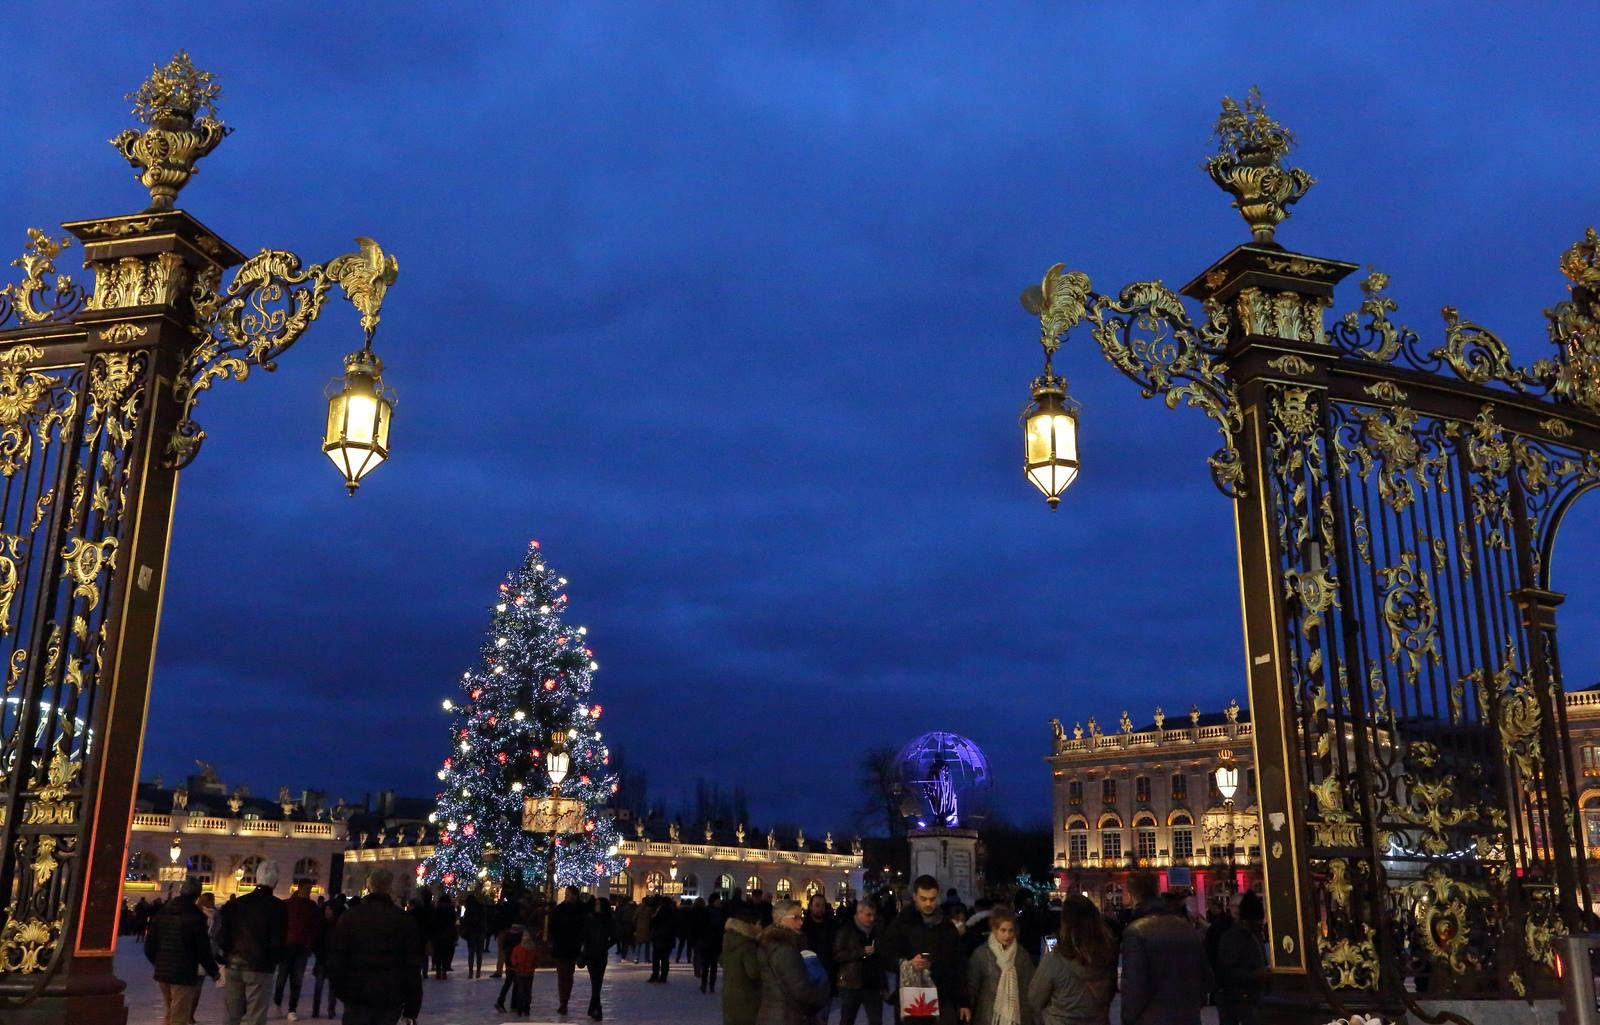 Noël à Nancy  (place Stanislas)